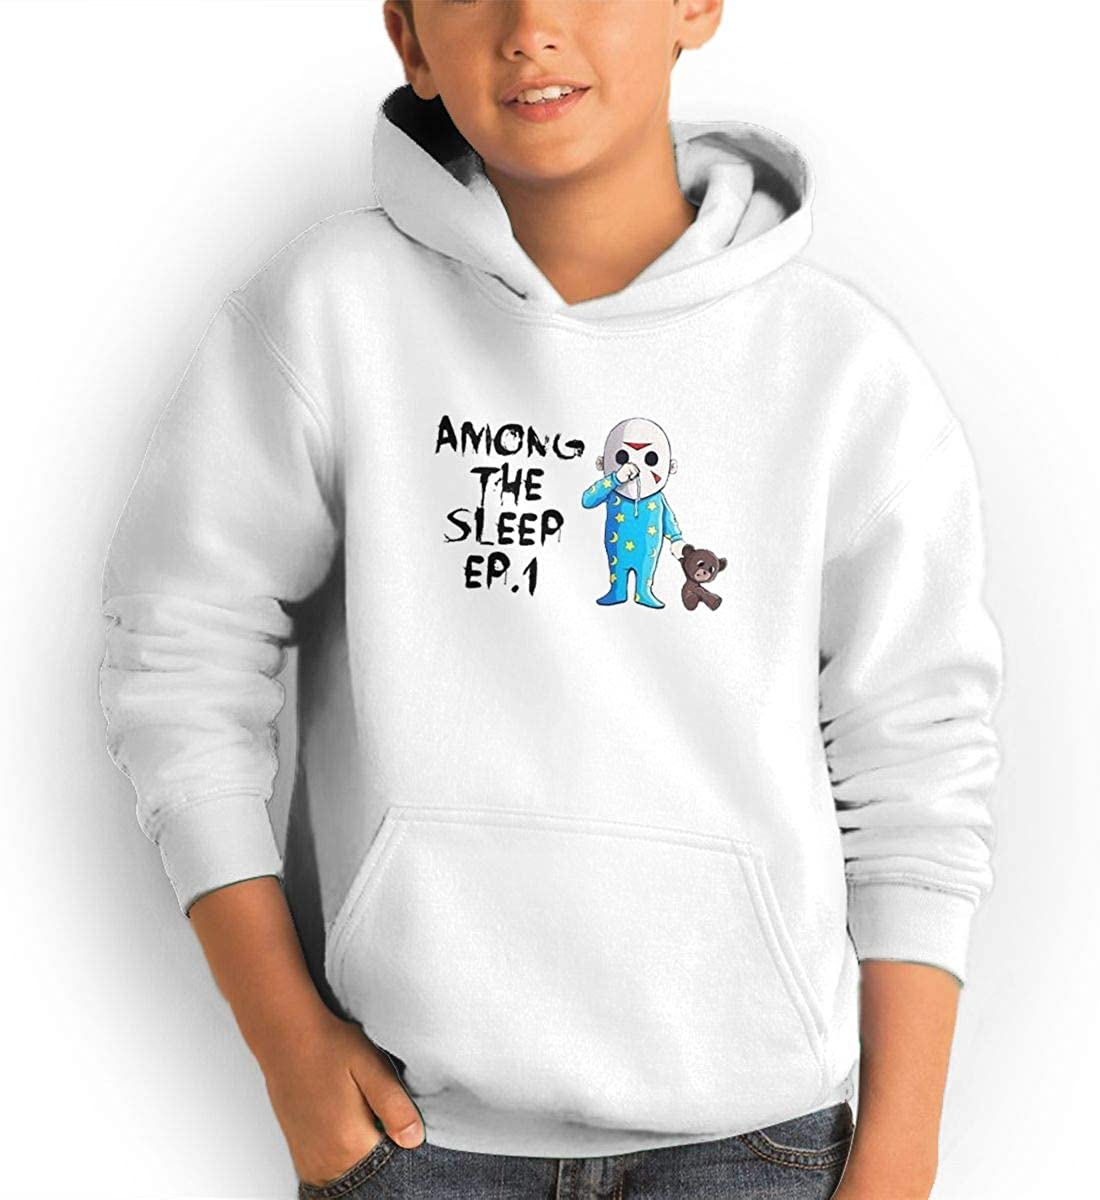 Red Coffee Teen Fashion Hoodie Hooded Sweatshirt Pocket Youth Boys Girls Sweaters,H2O Delirious